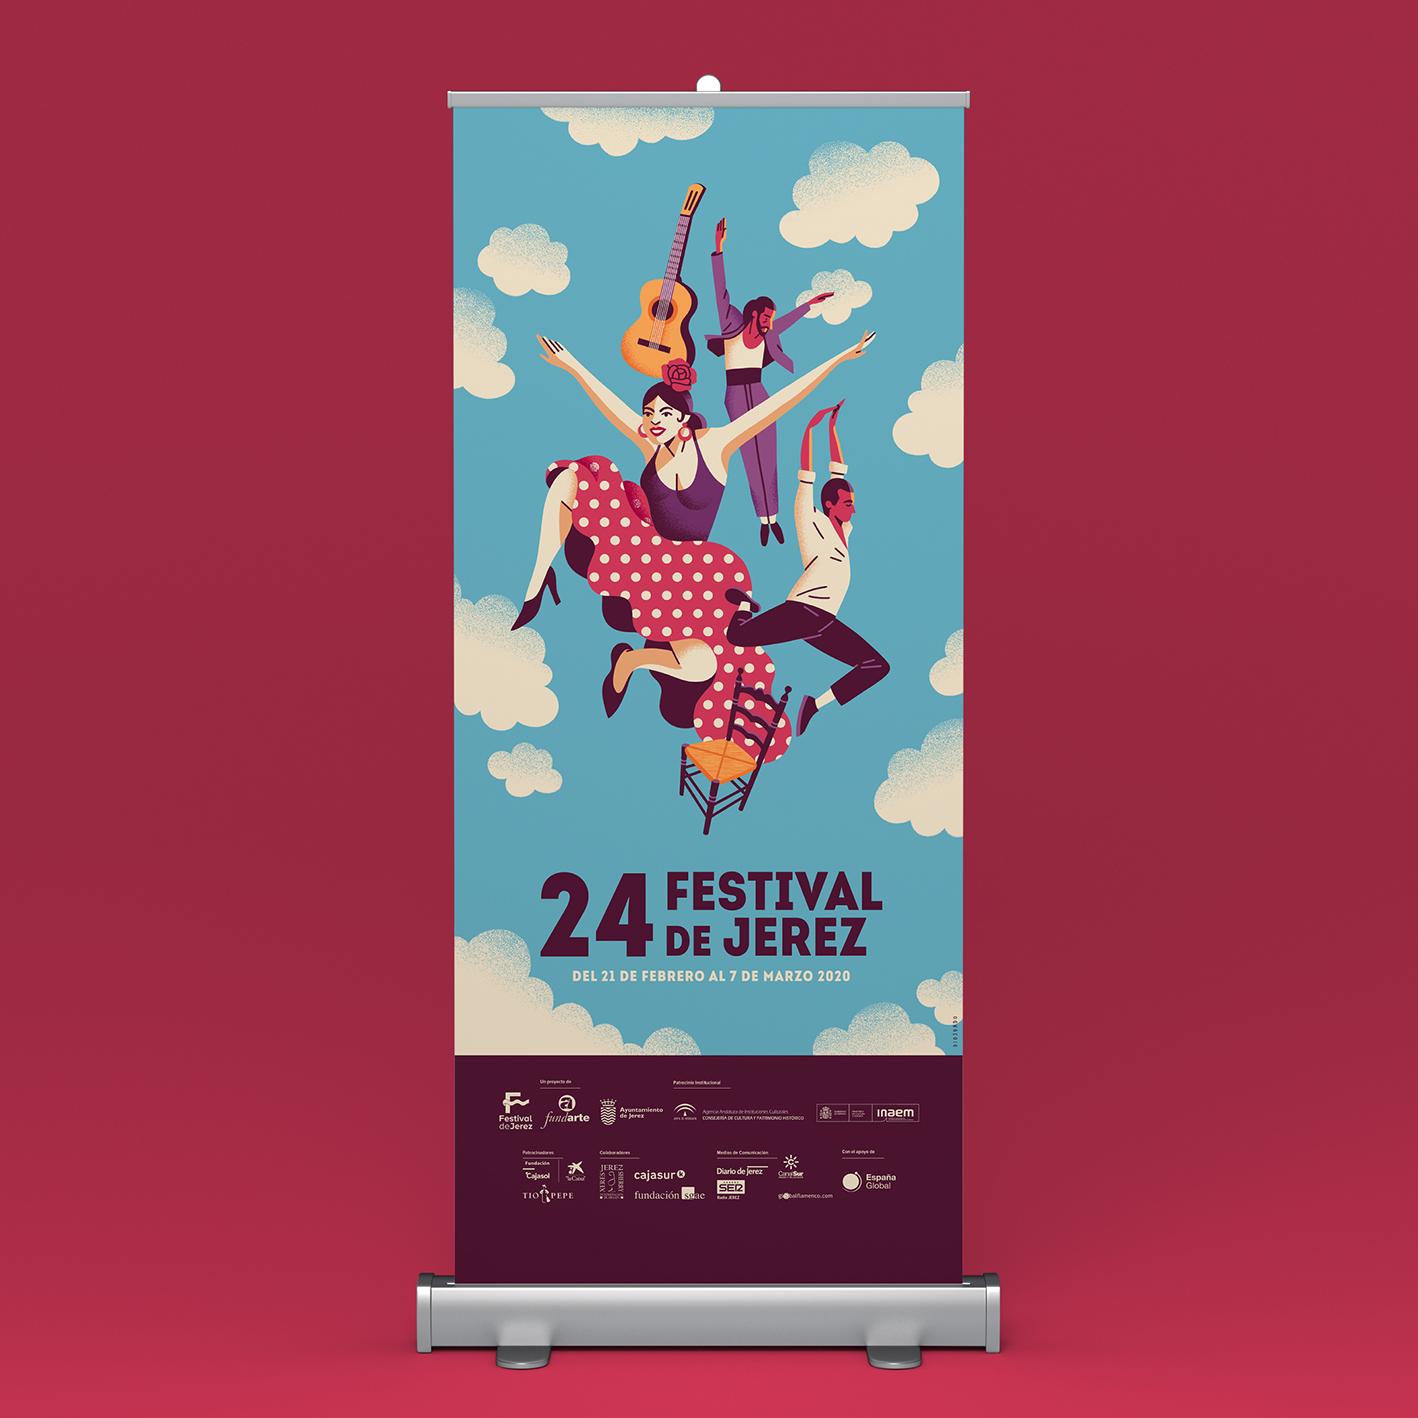 Daniel Diosdado: 24 Festival de Jerez